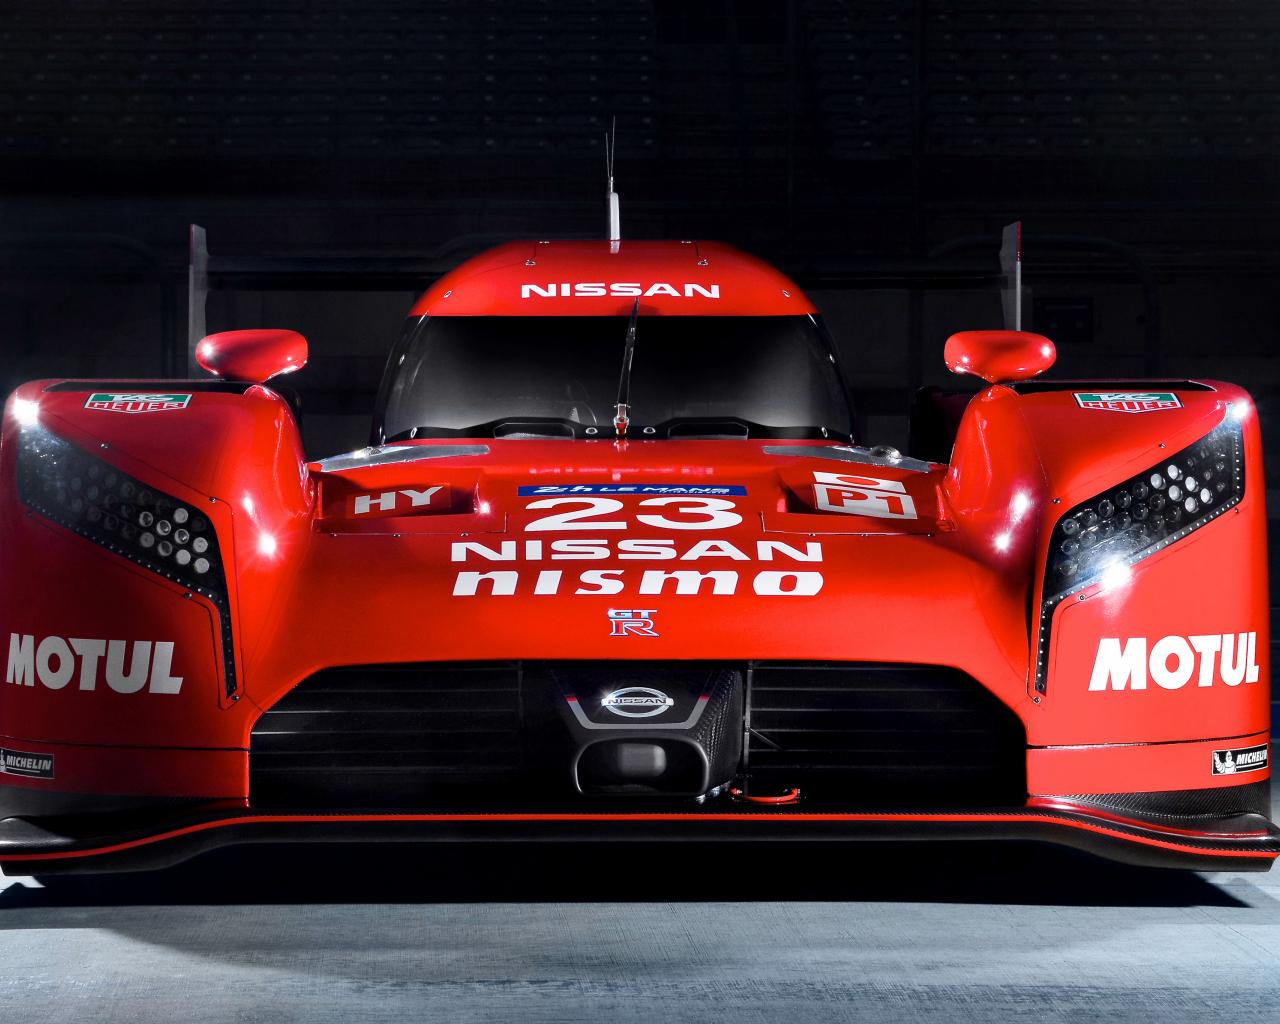 1280x1024 wallpaper Nissan GT-R LM Nismo prototype racing car